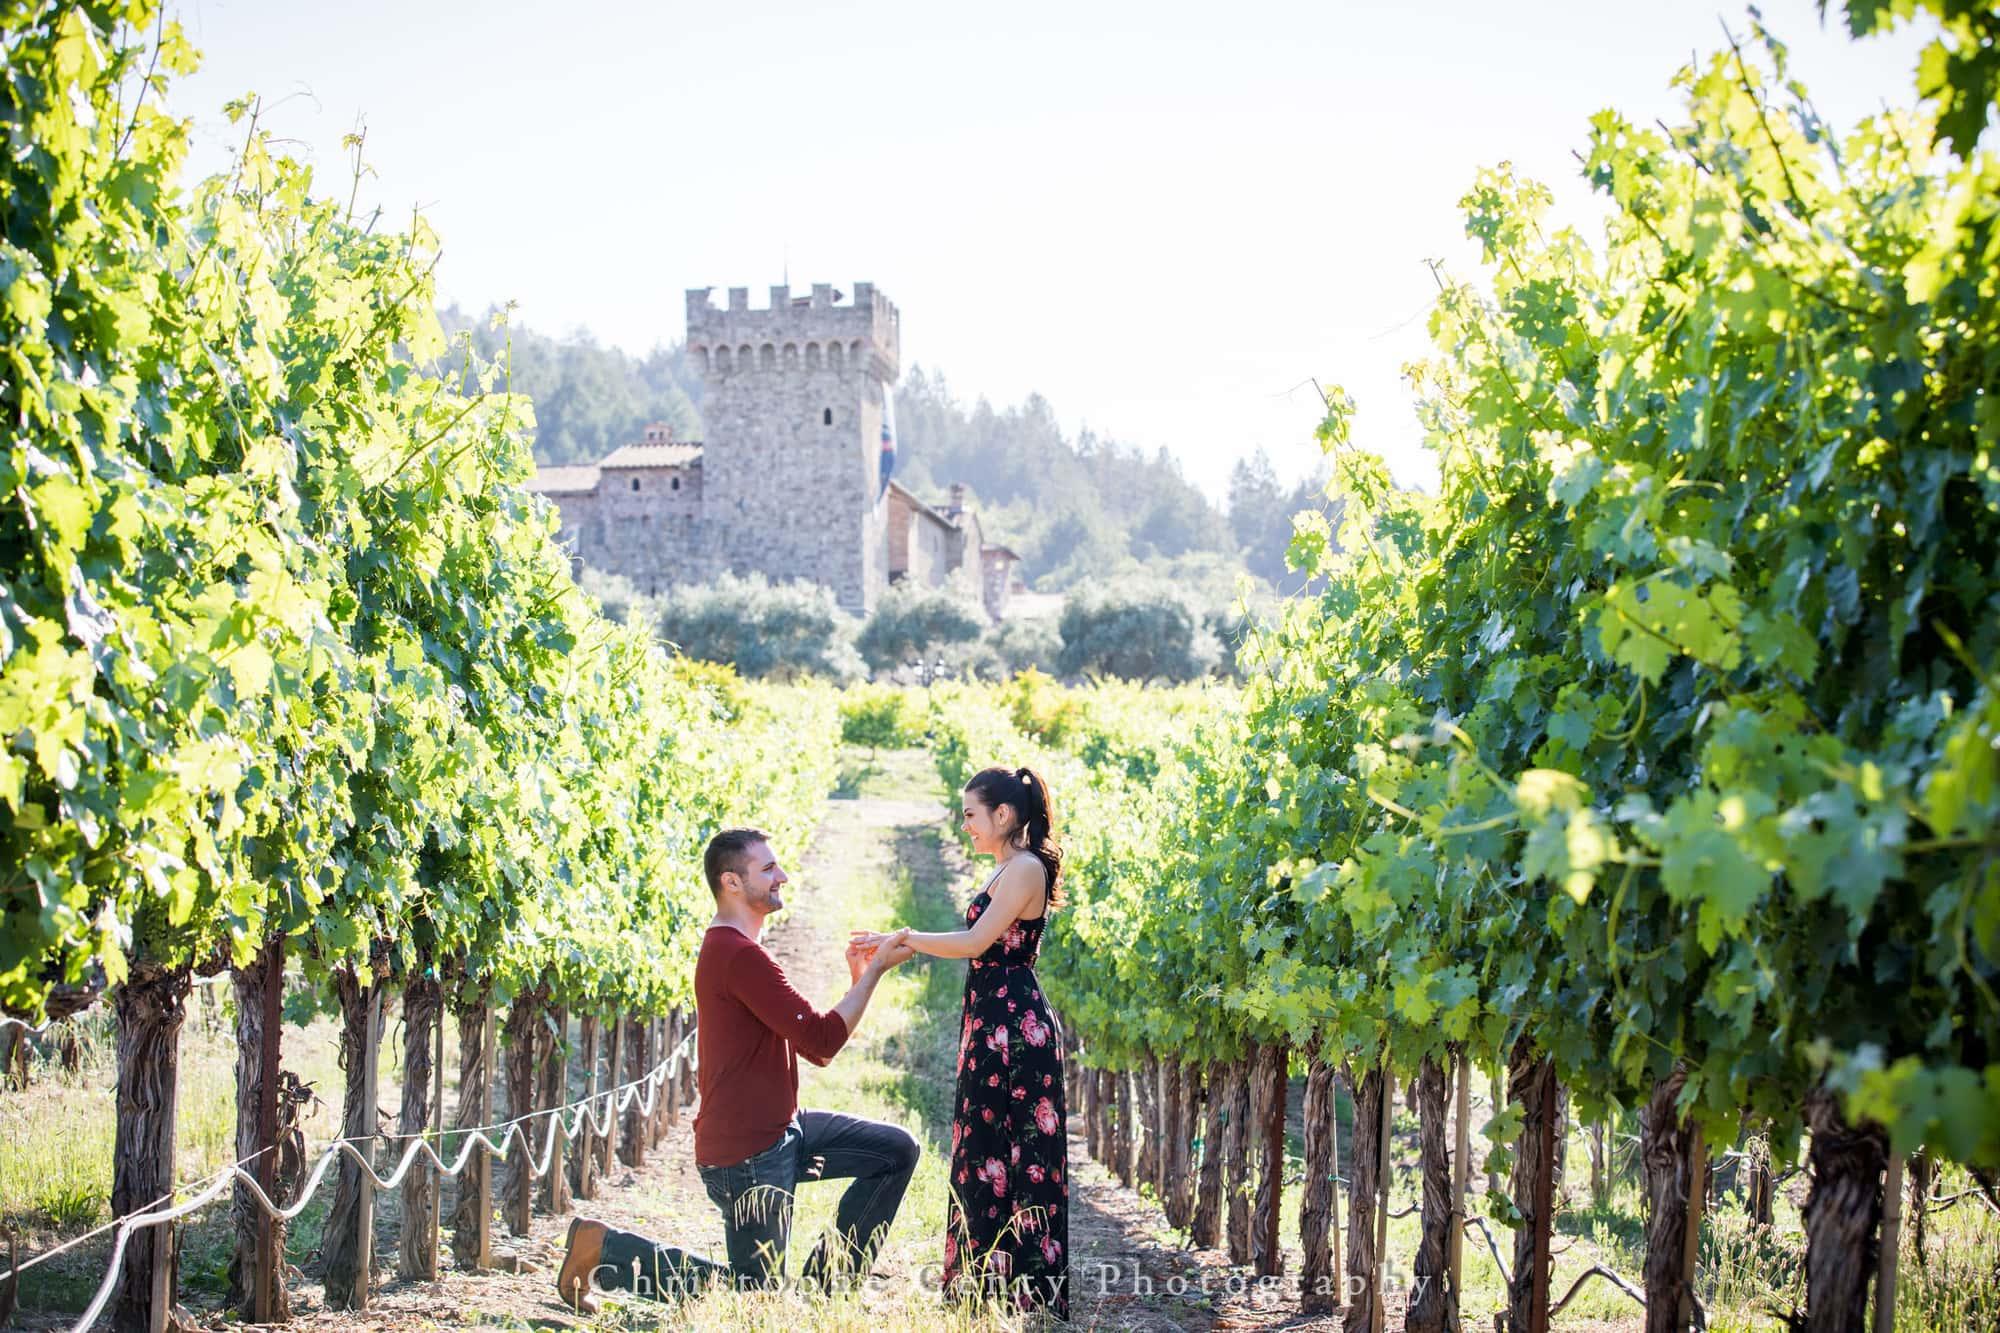 Castello di Amorosa Marriage Proposal Photography 317